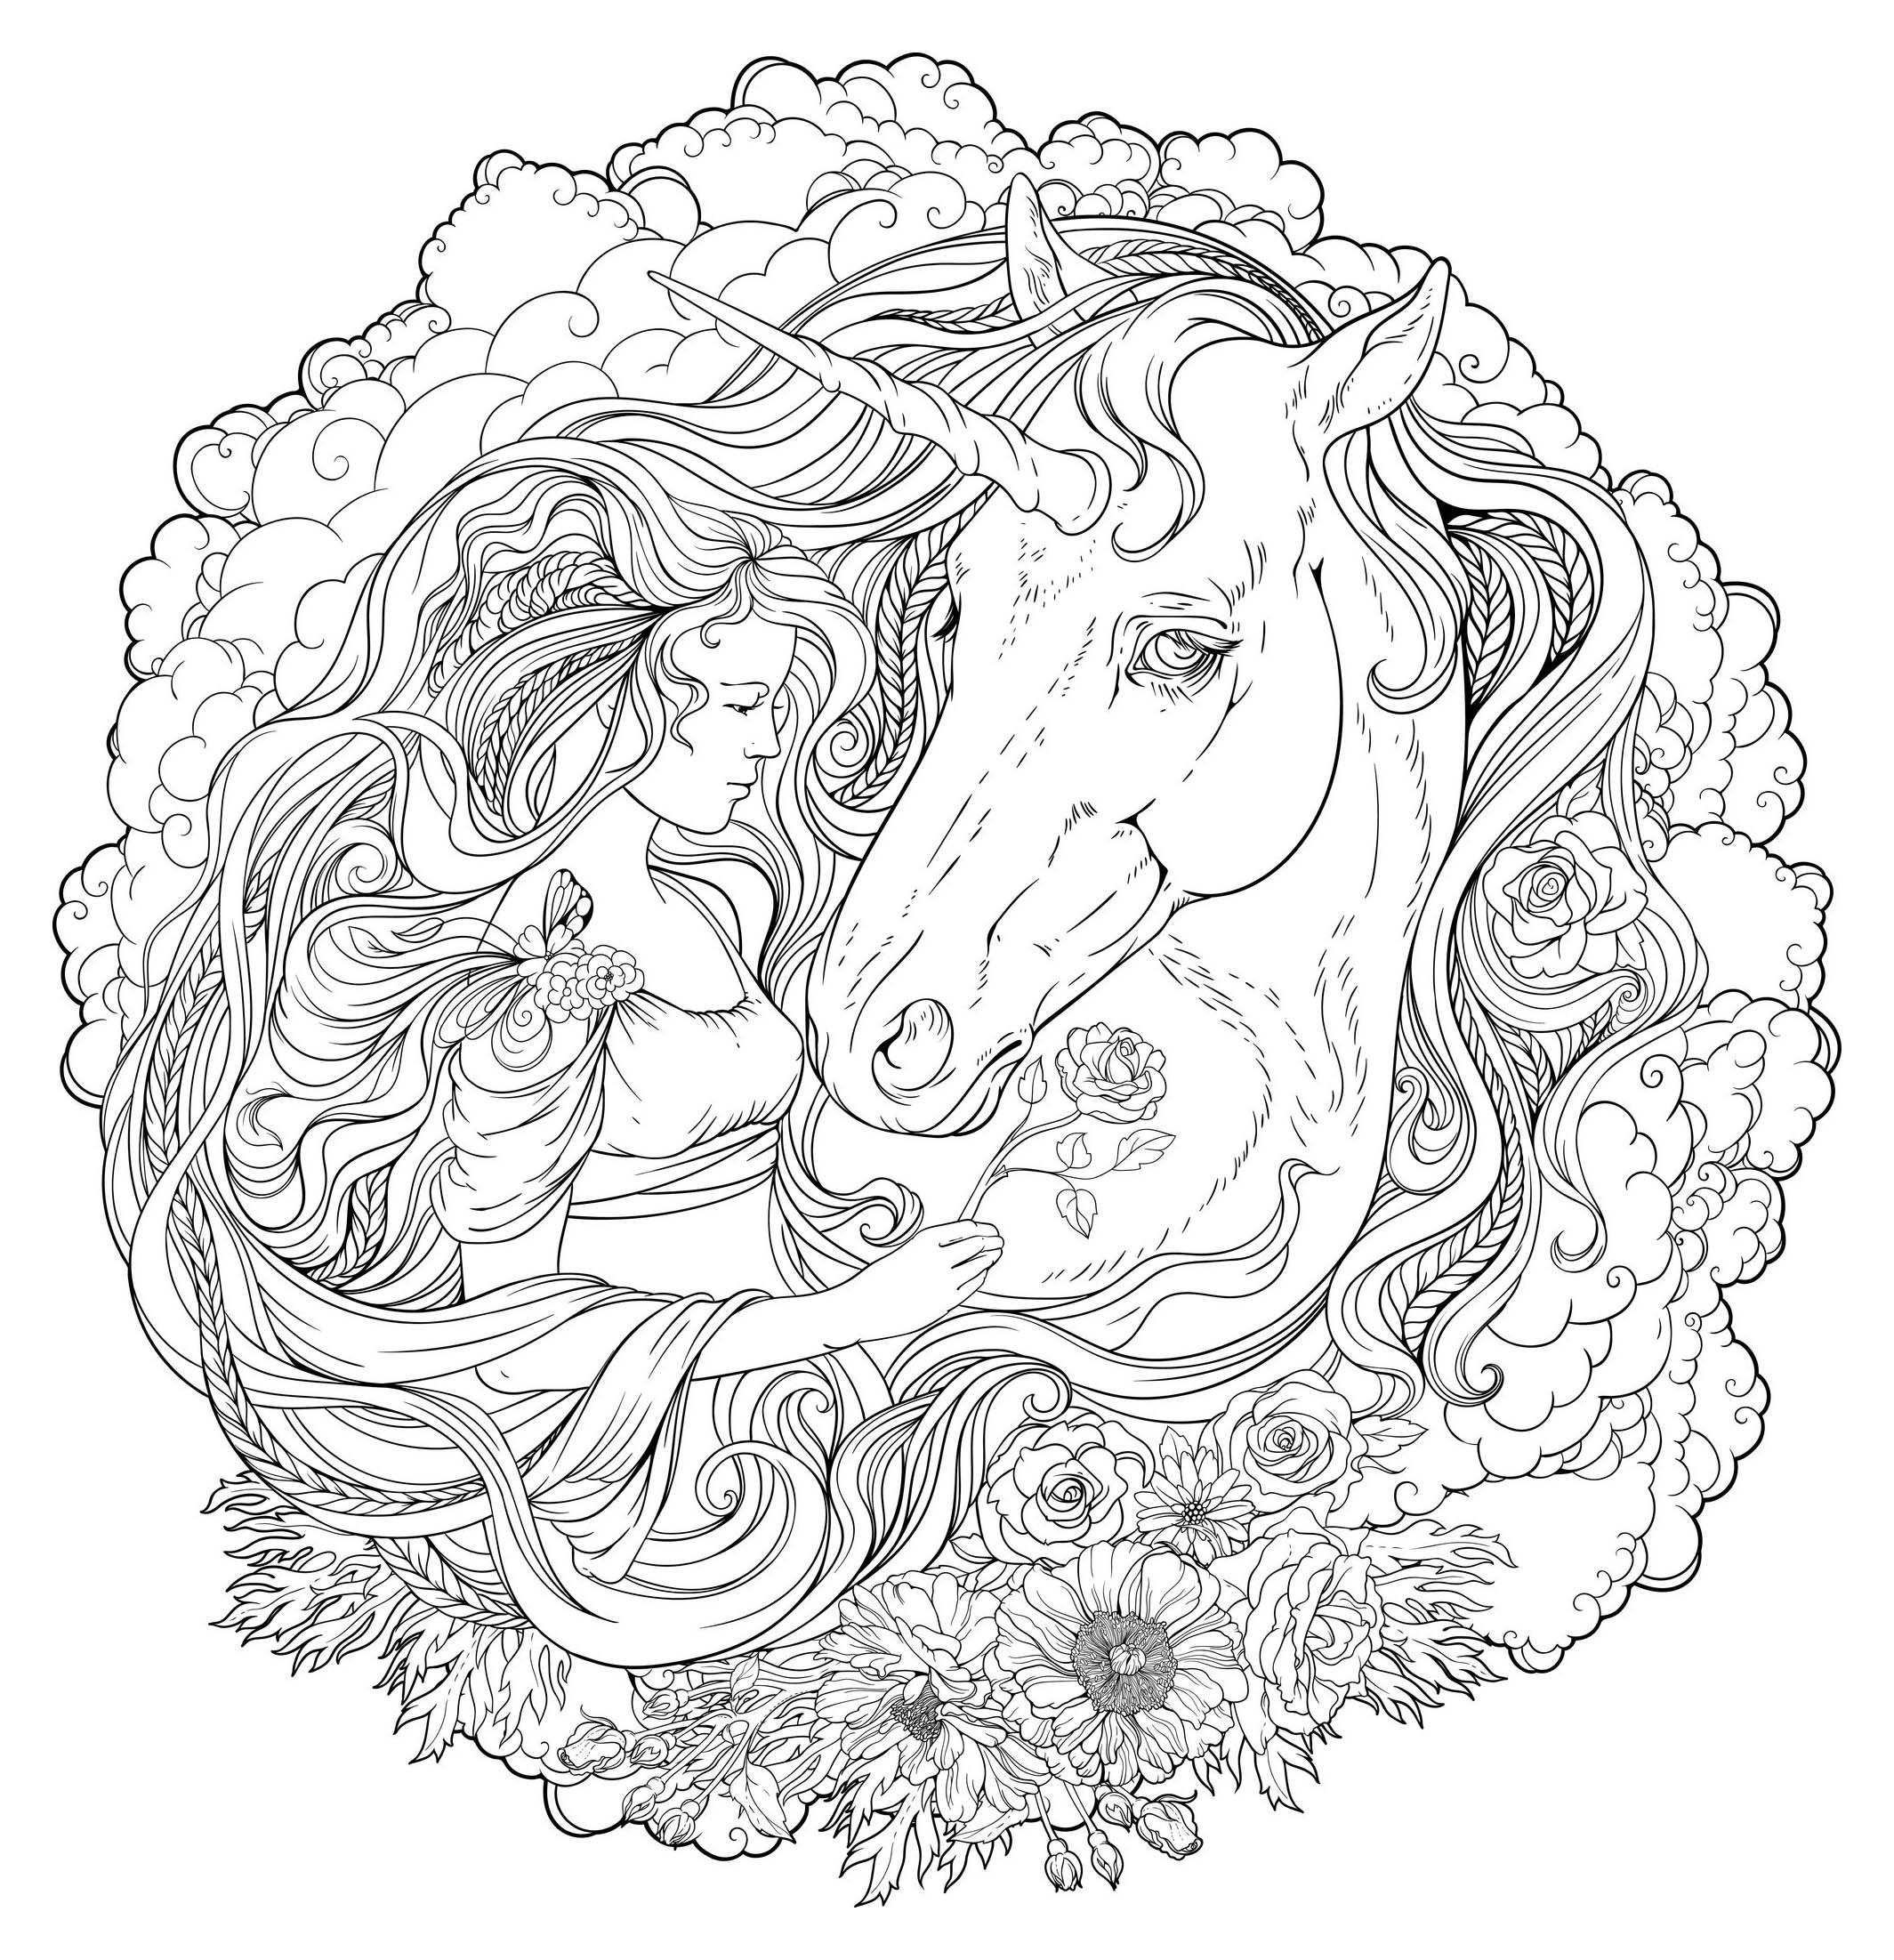 Mandala Fille Et Licorne Mandalas Avec Personnages 100 Mandalas Zen Anti Stress